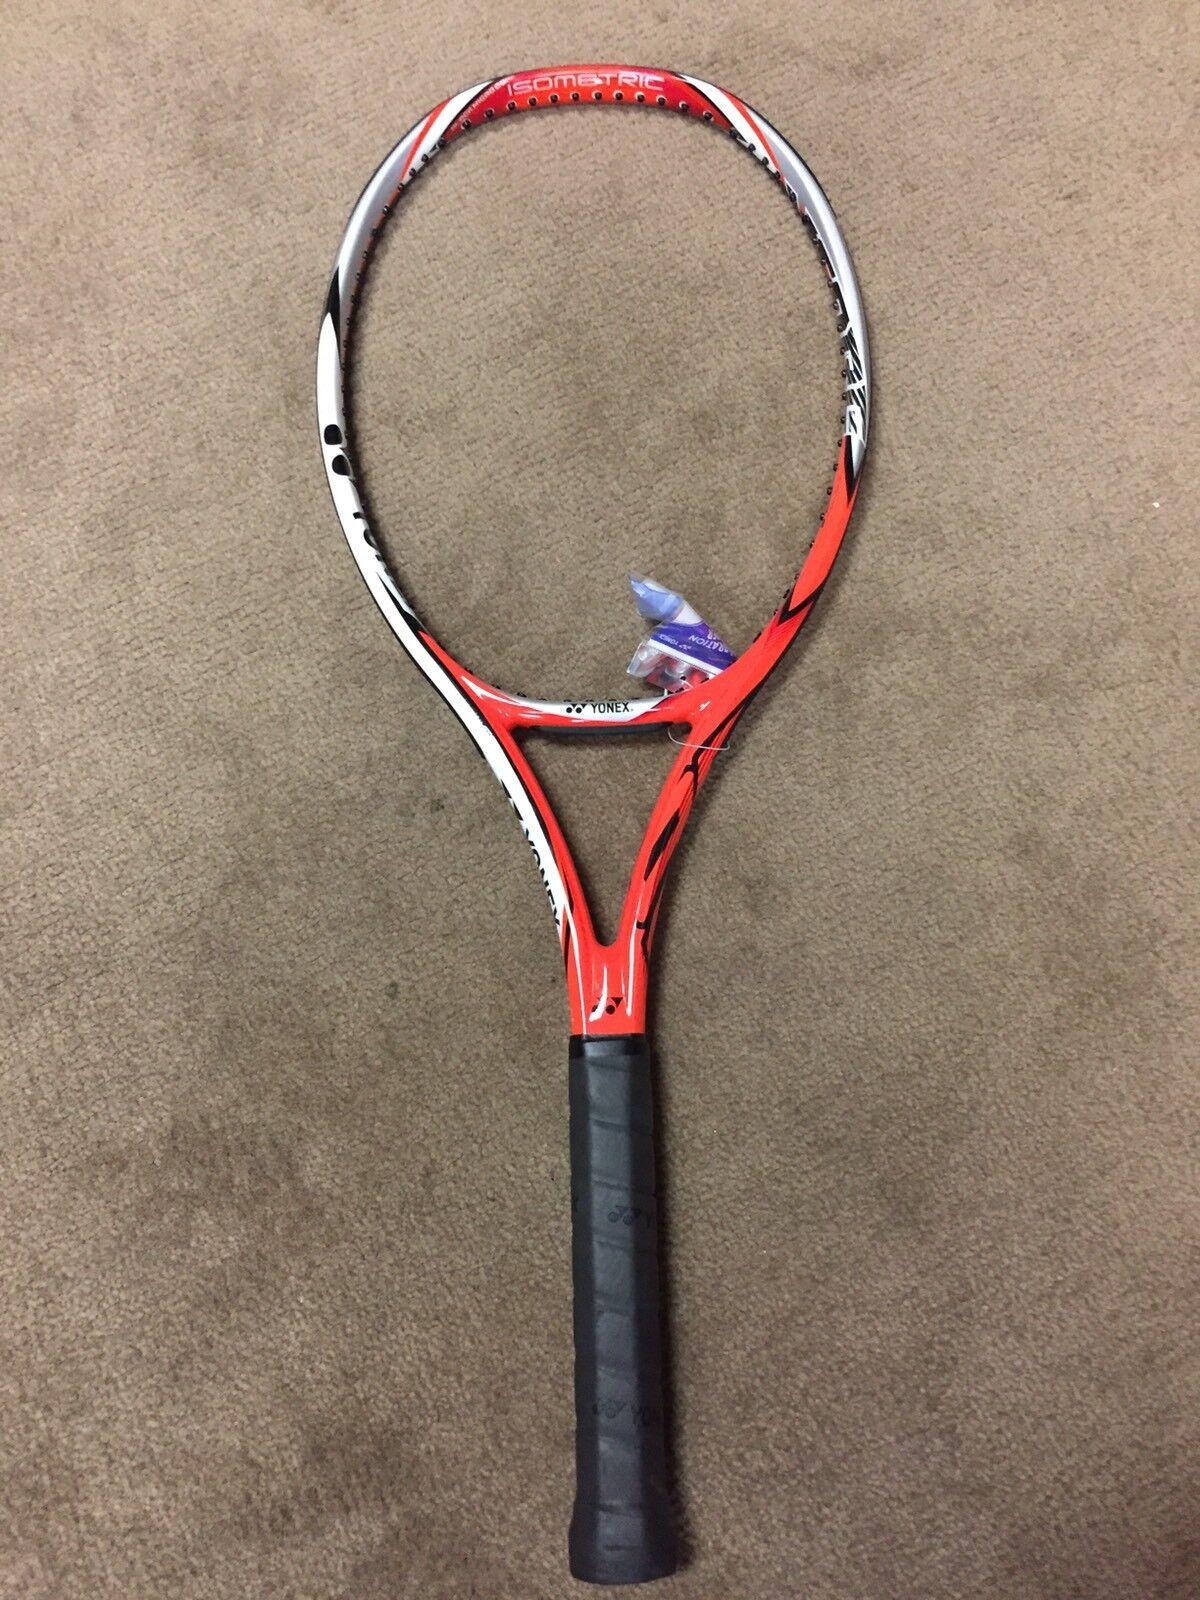 New Yonex VCORE Si 98 (16x20) Tennis Racquet Unstrung Sz 4 1 4 Made in Japan